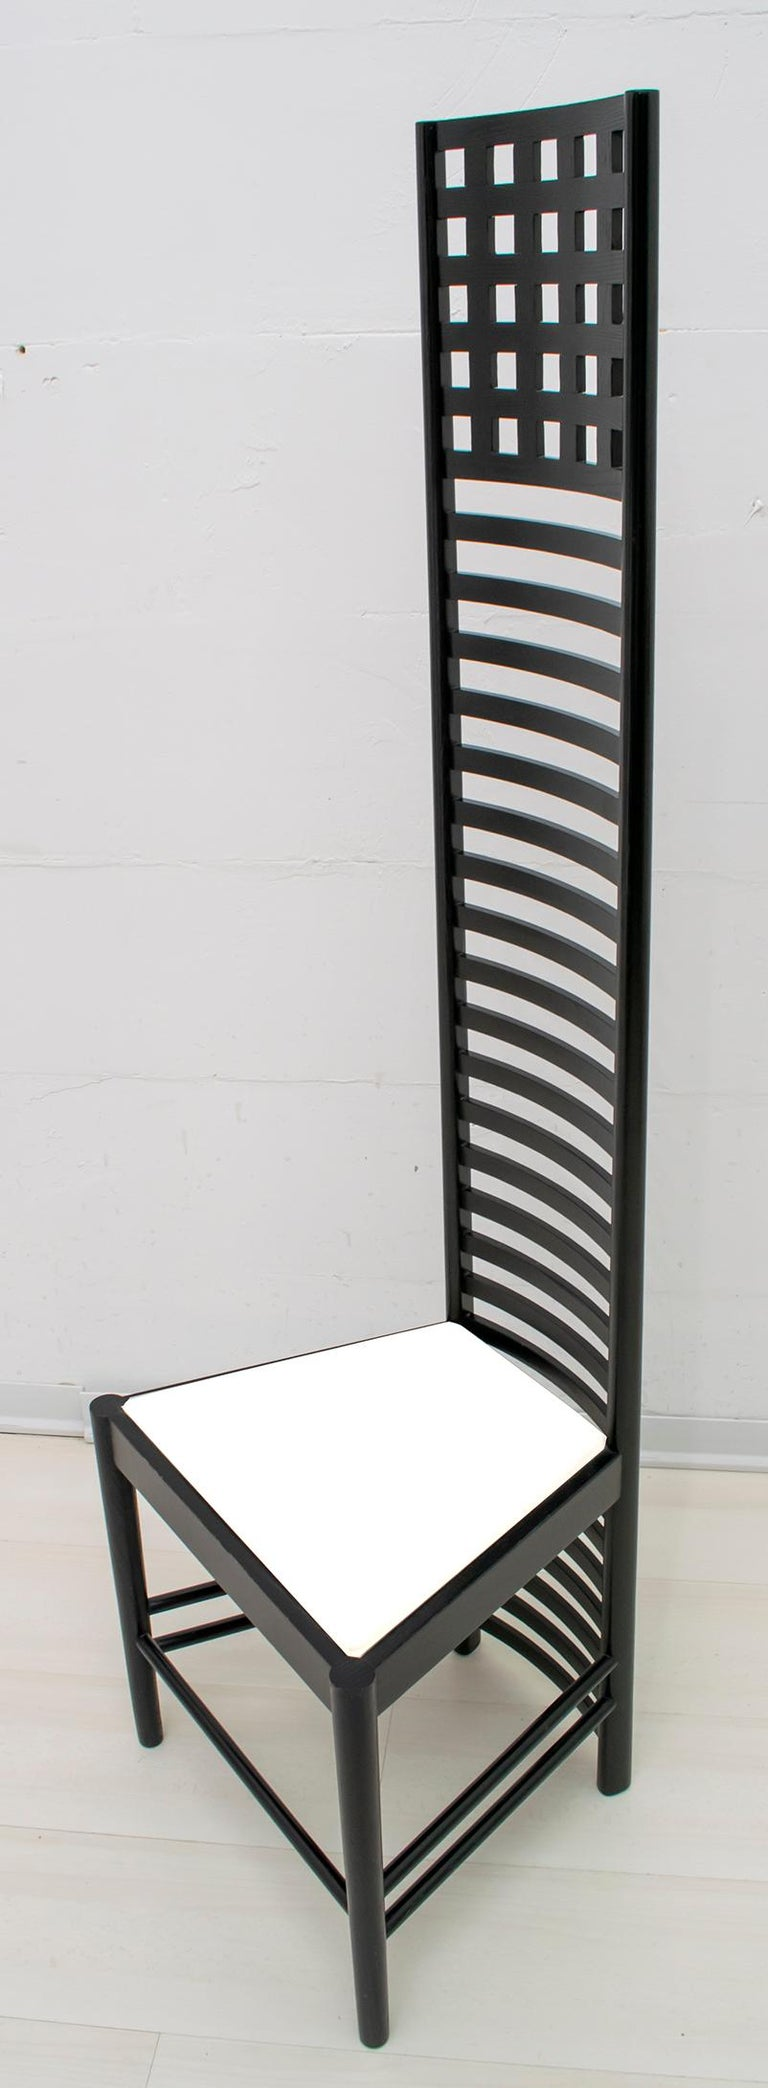 Ebonized Charles Rennie Mackintosh High Back Chairs